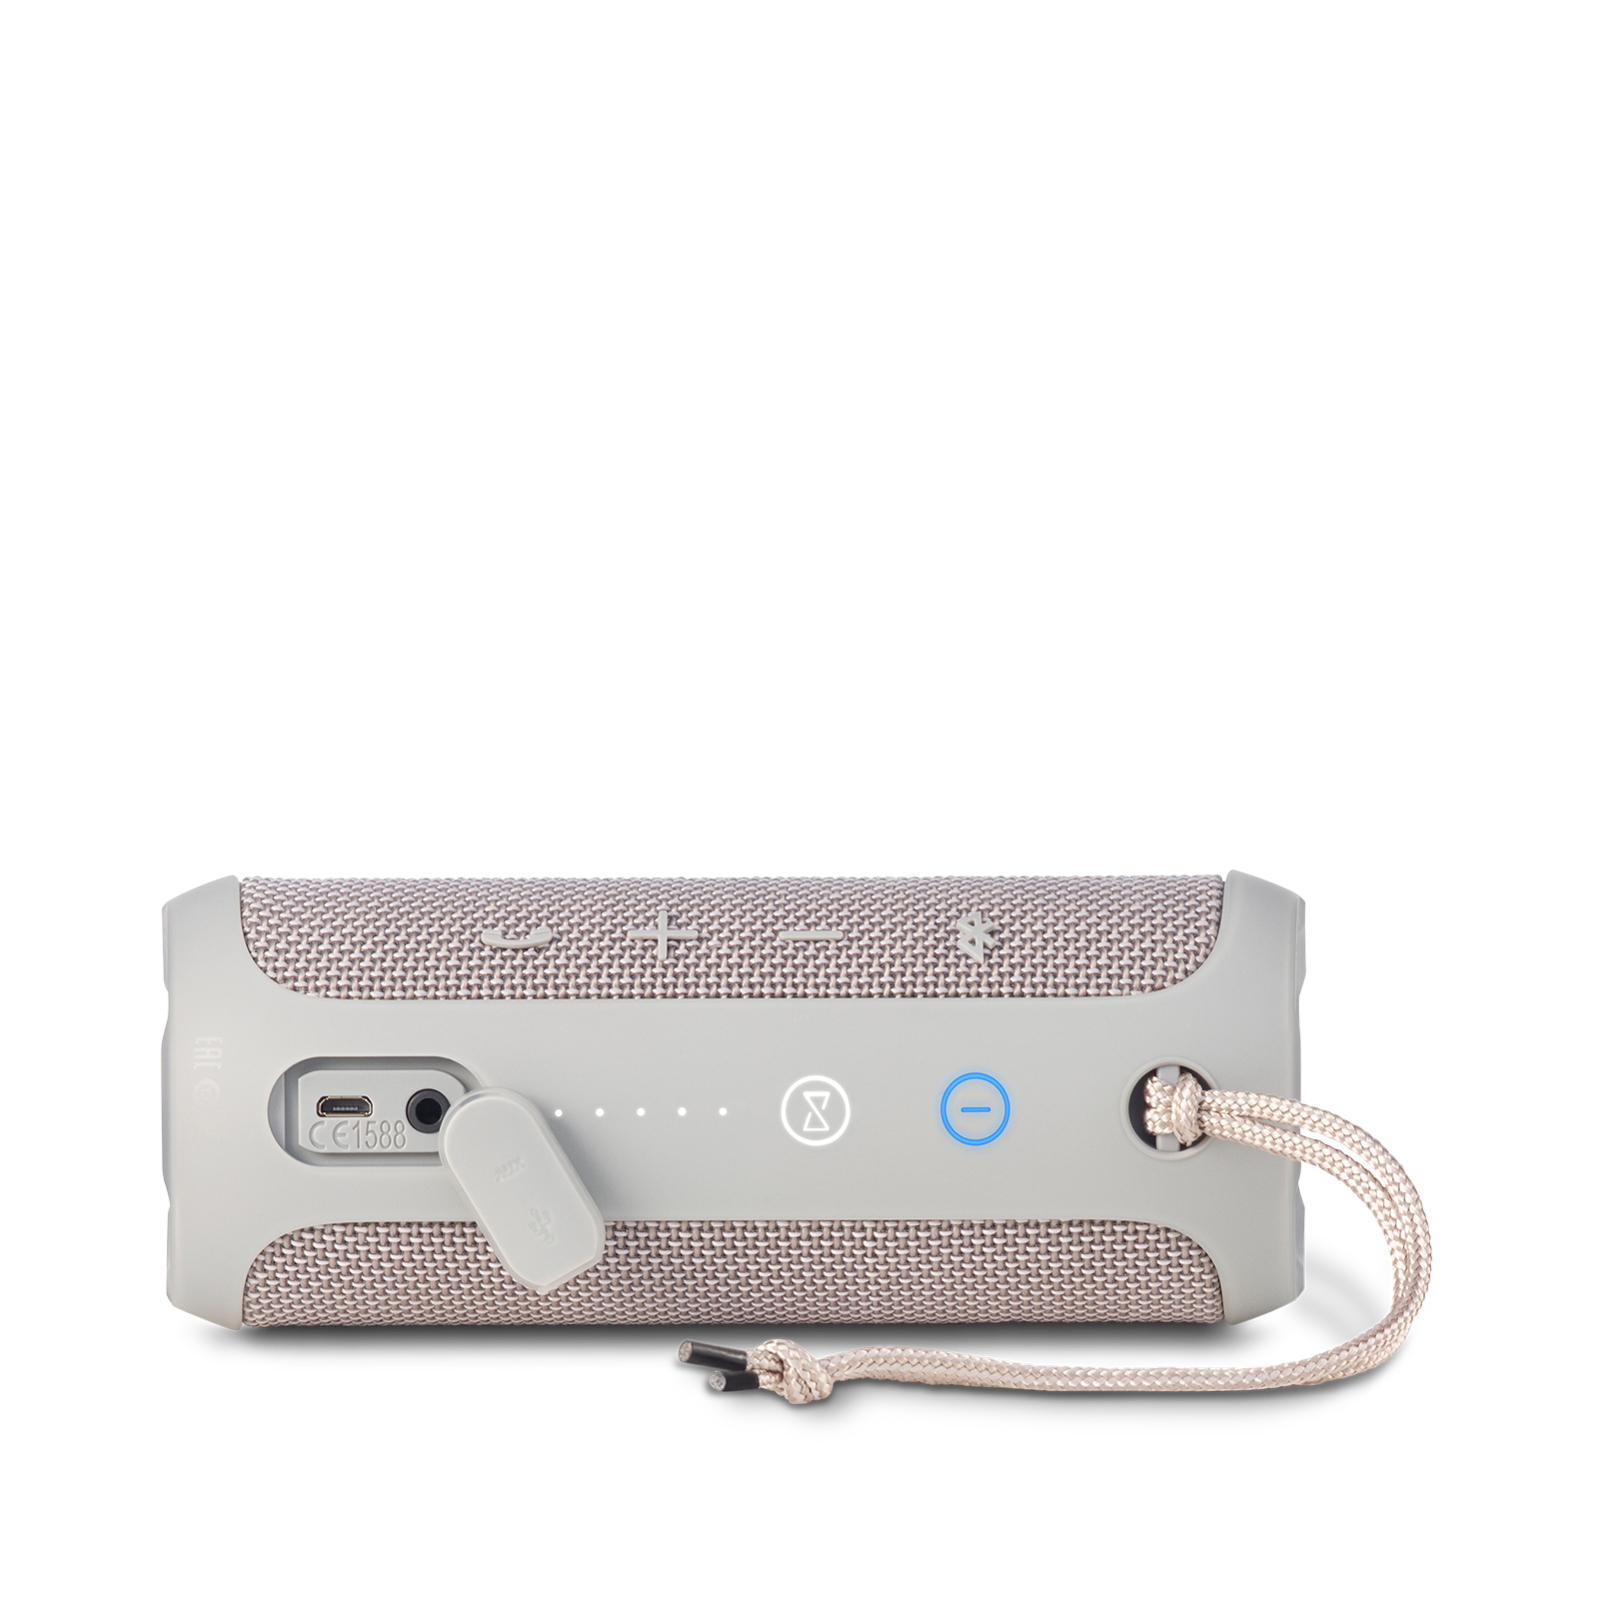 JBL Flip 3 - Grey - Splashproof portable Bluetooth speaker with powerful sound and speakerphone technology - Detailshot 3